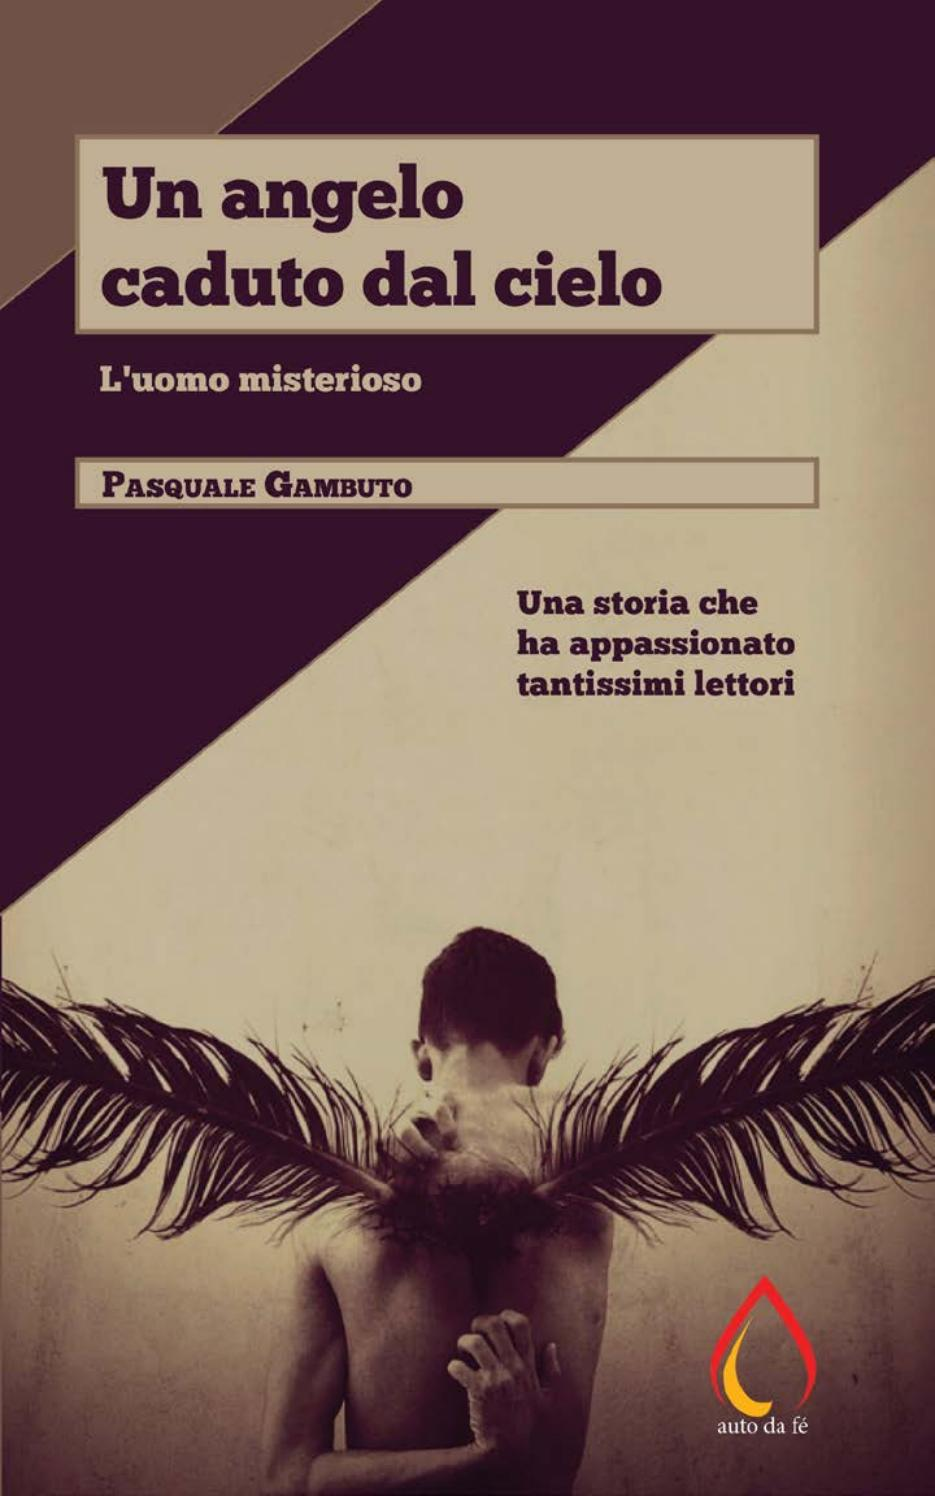 Un angelo caduto dal cielo  L'uomo misterioso by FdBooks - issuu